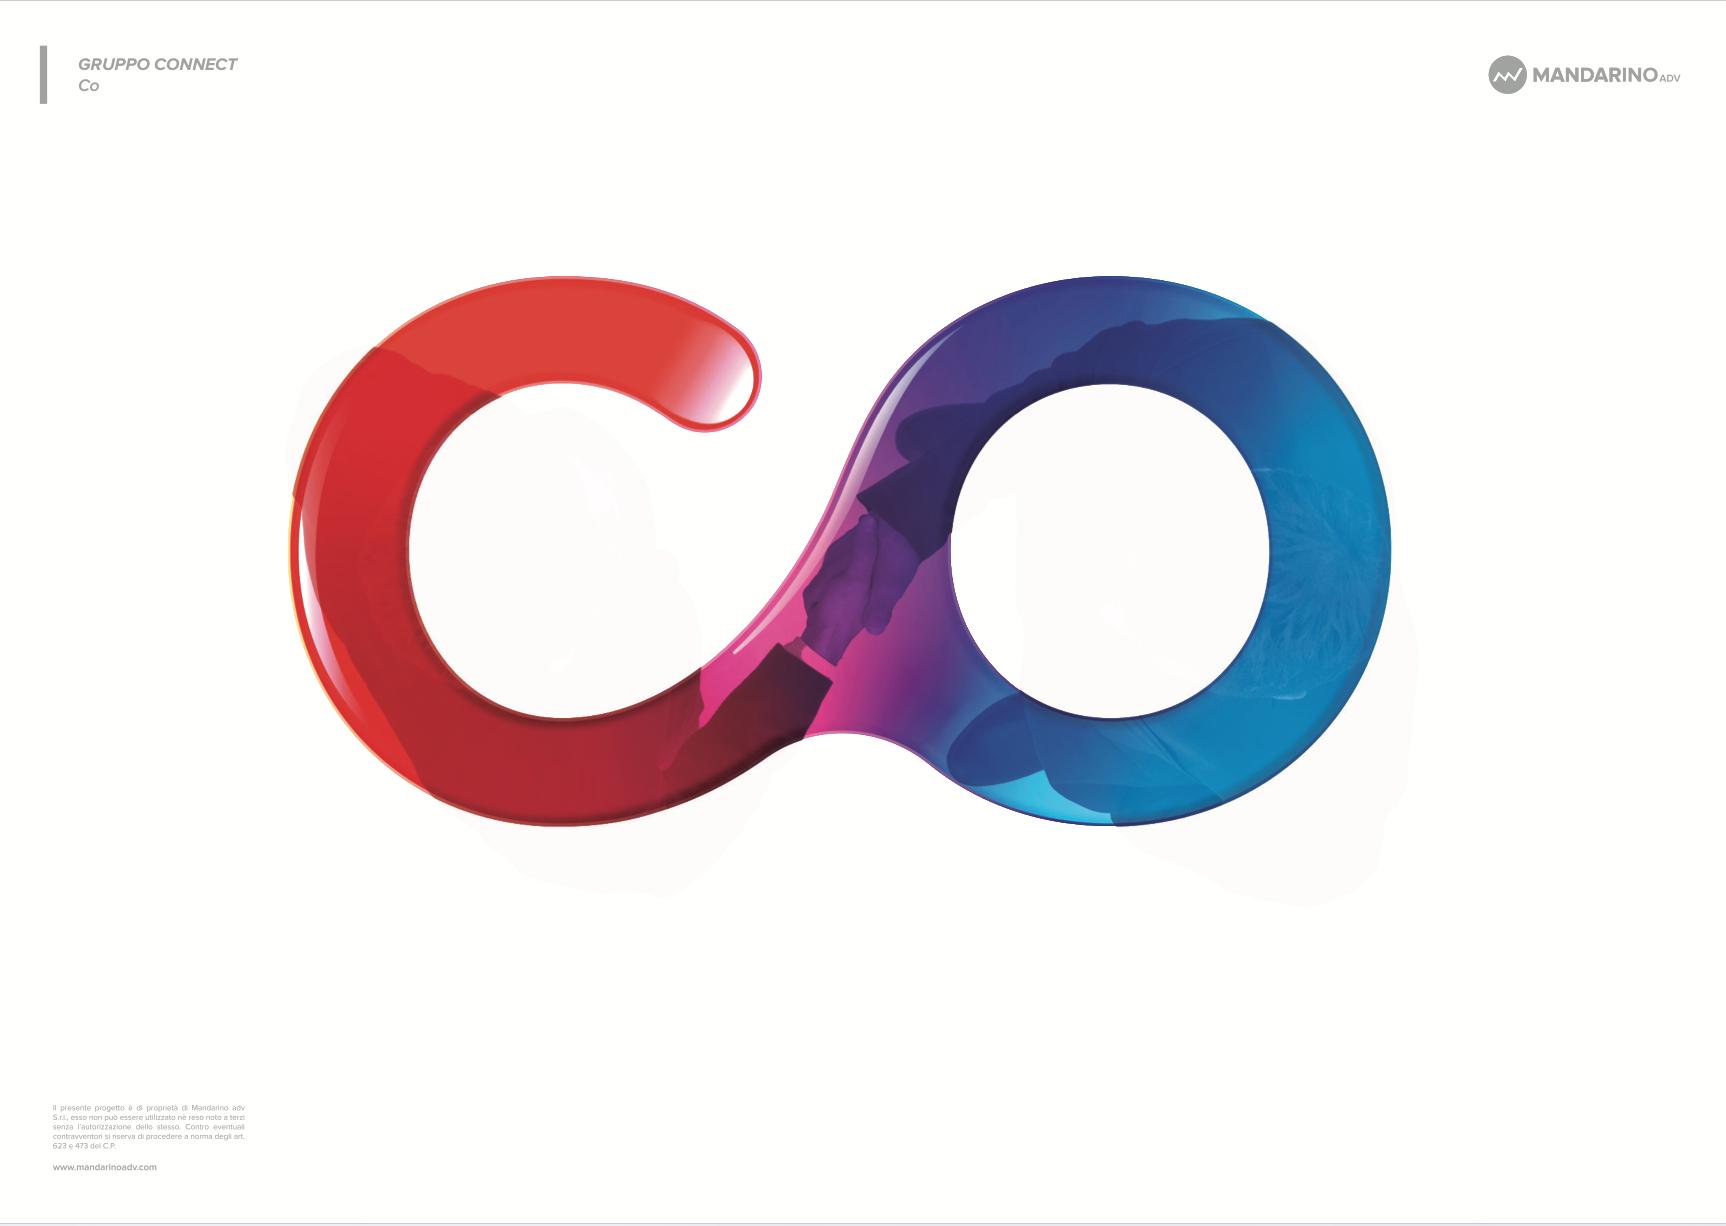 Rebranding gruppo connect